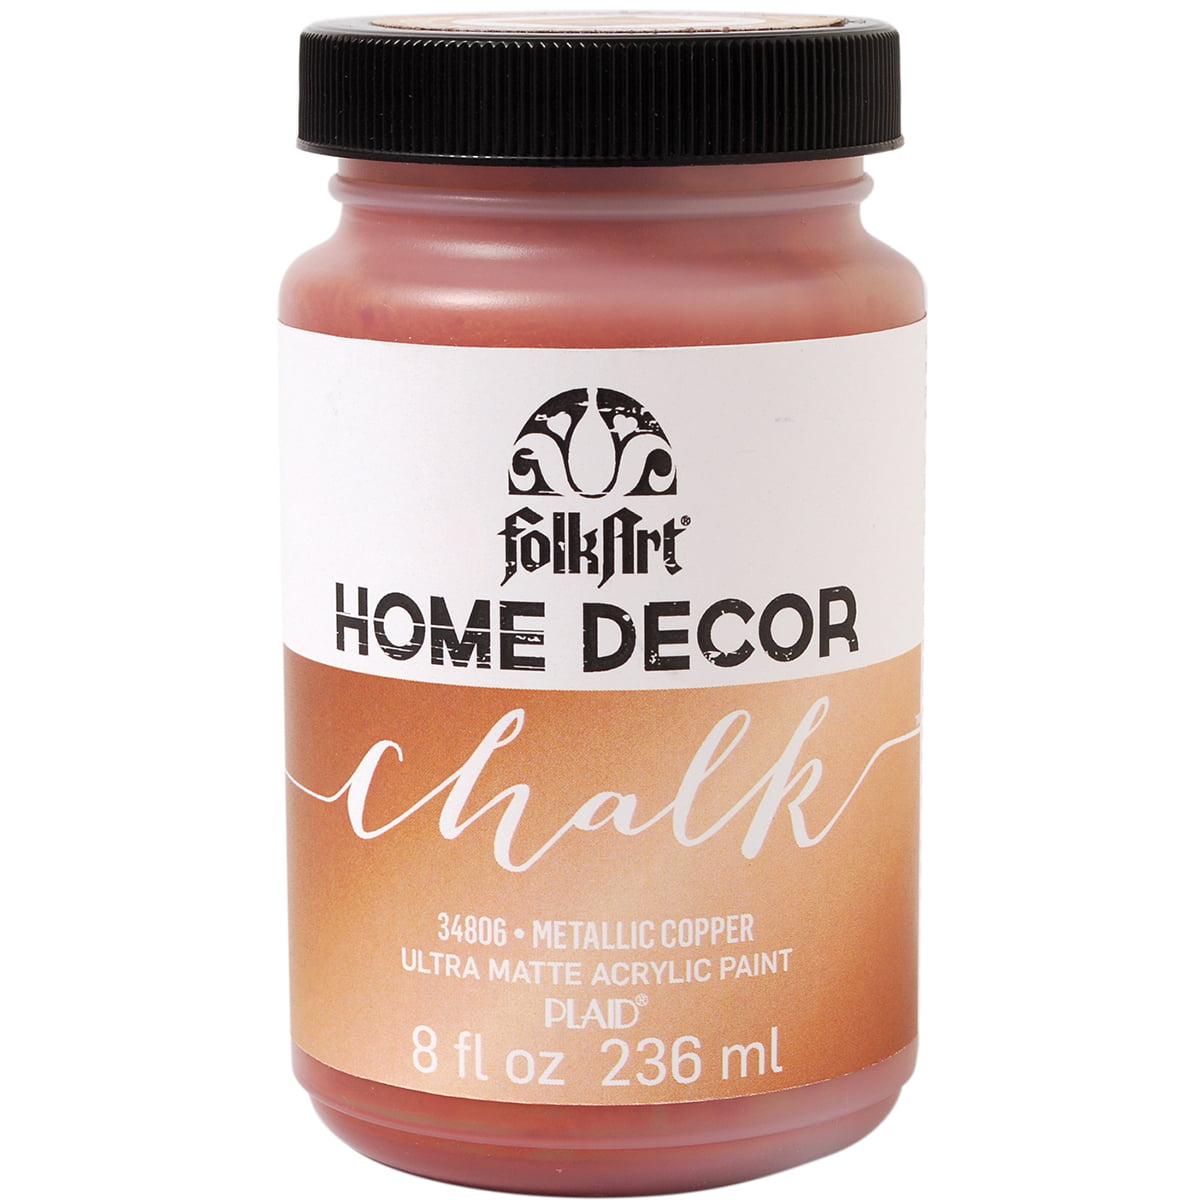 Folk Art Home Decor Chalk Paint Review from i5.walmartimages.com